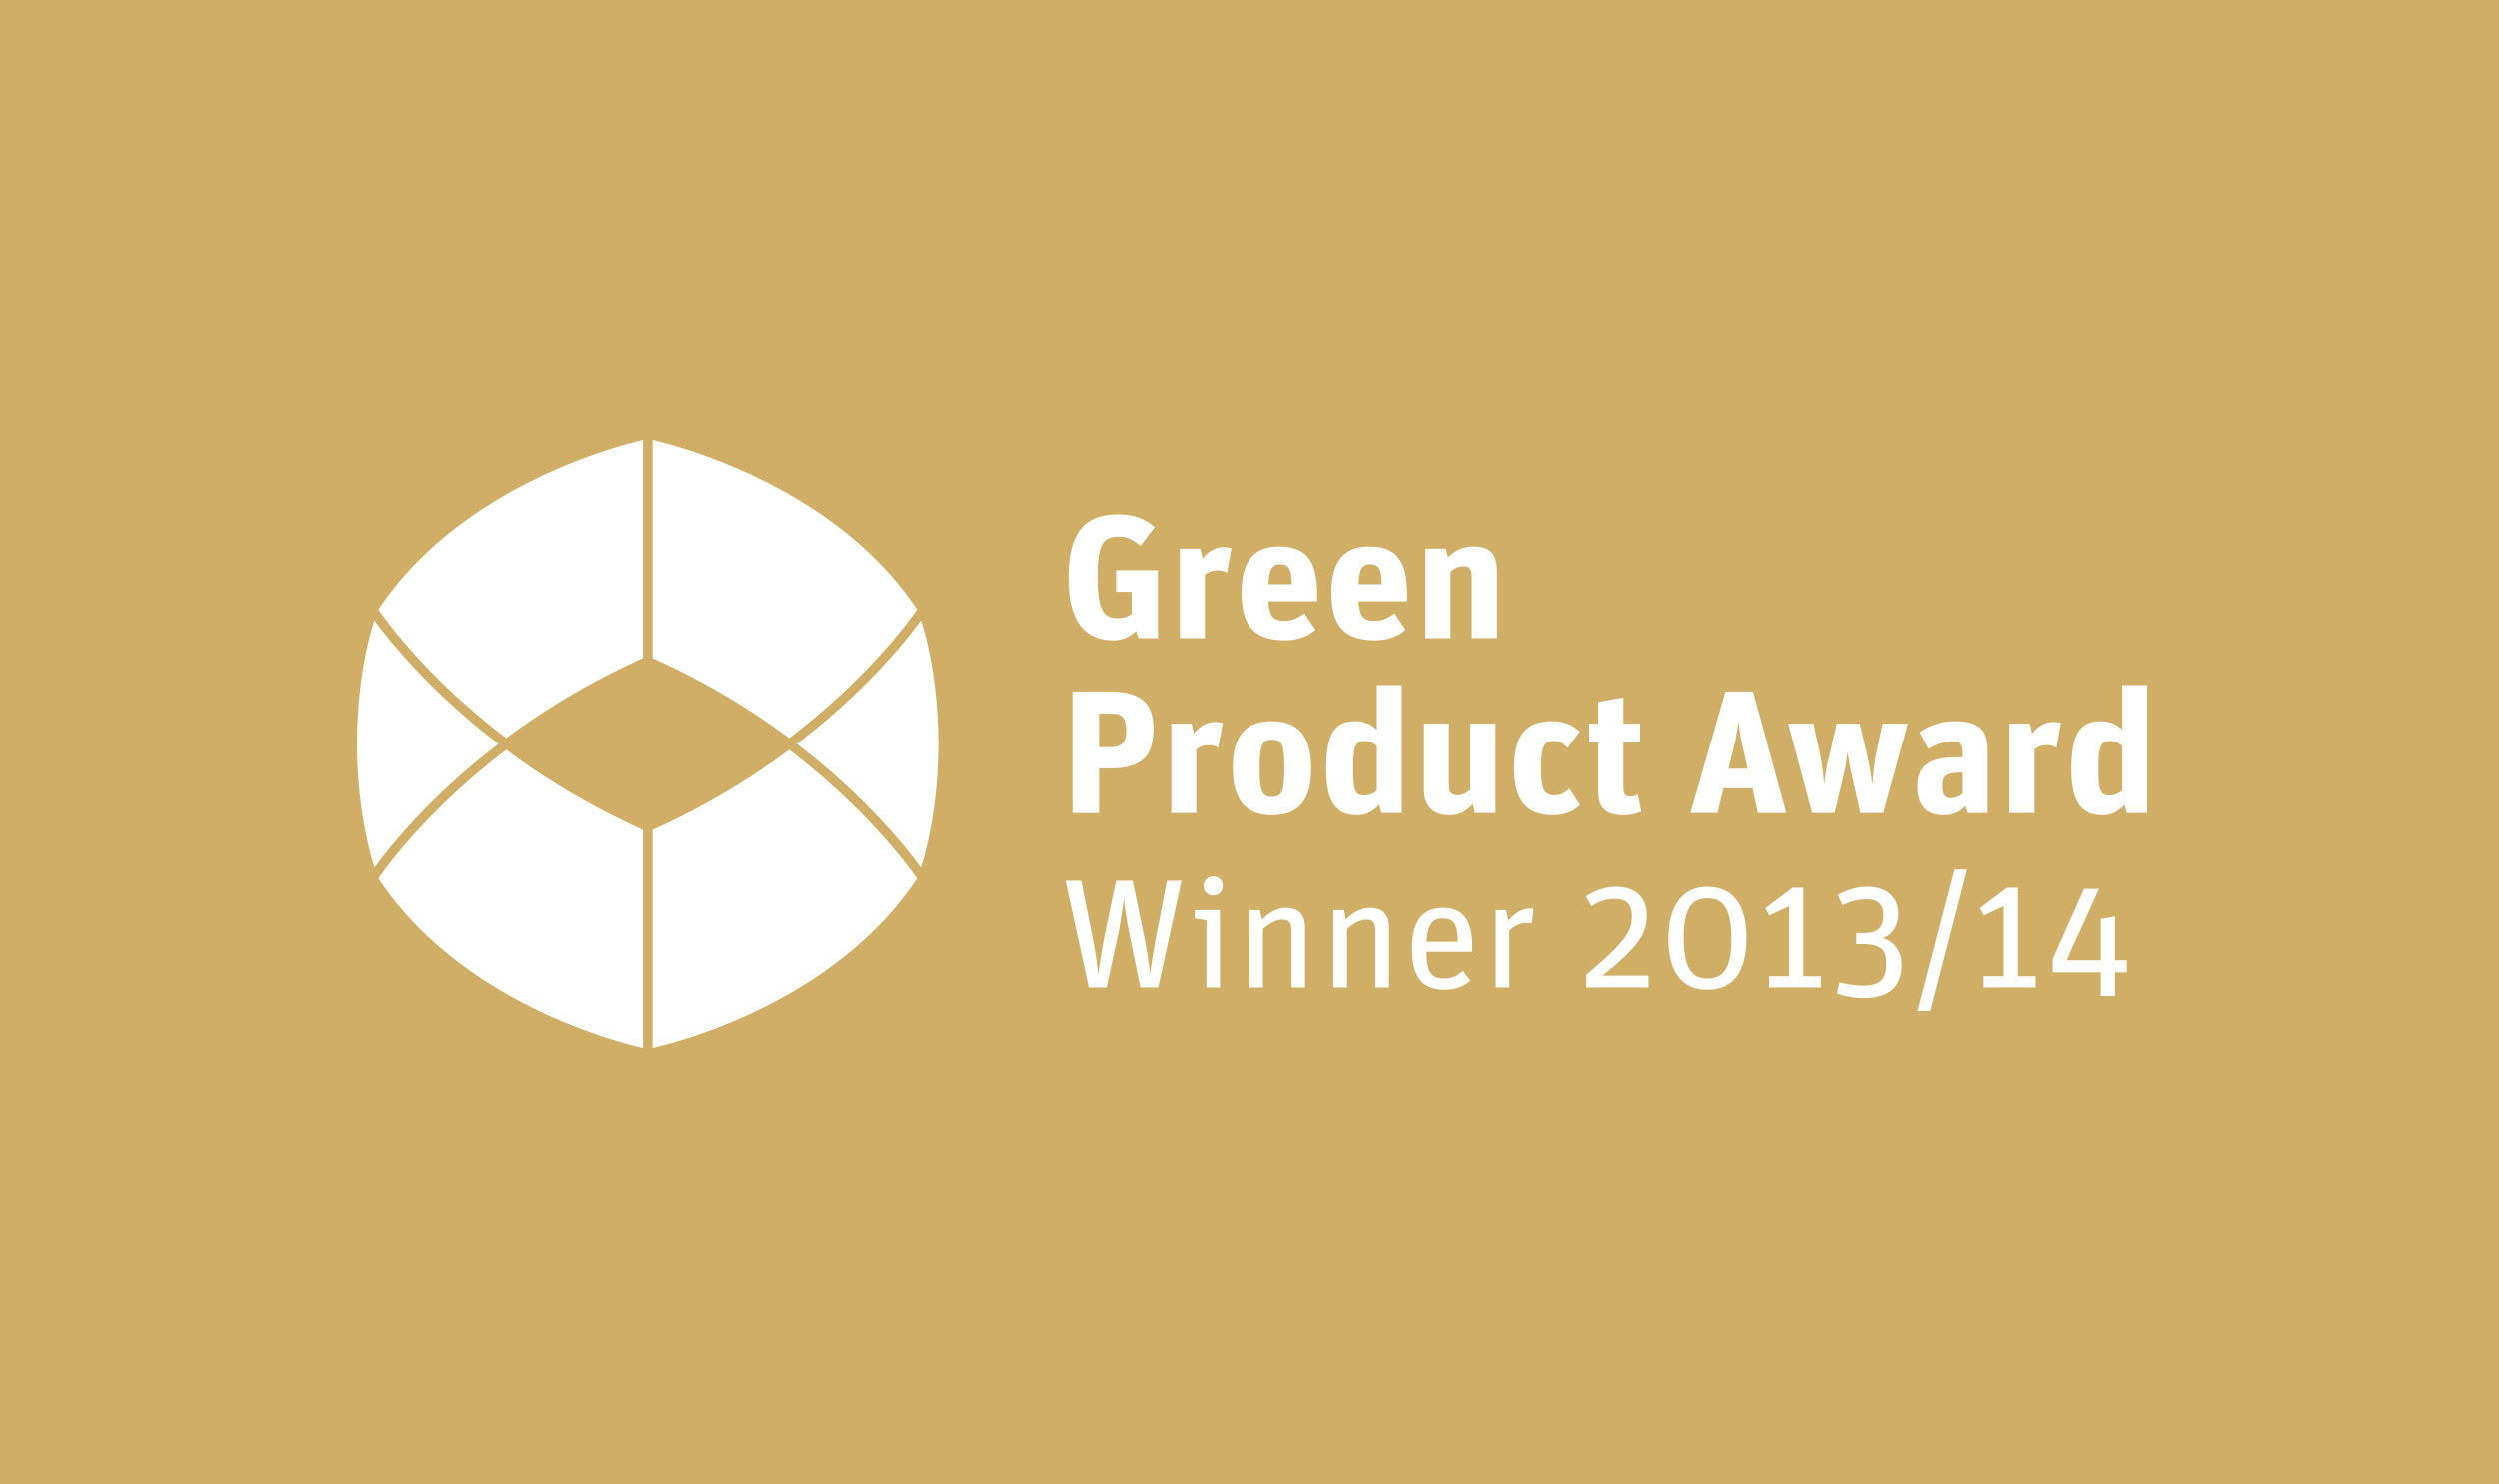 AWARD_Green-Product-Award_2013_Winner